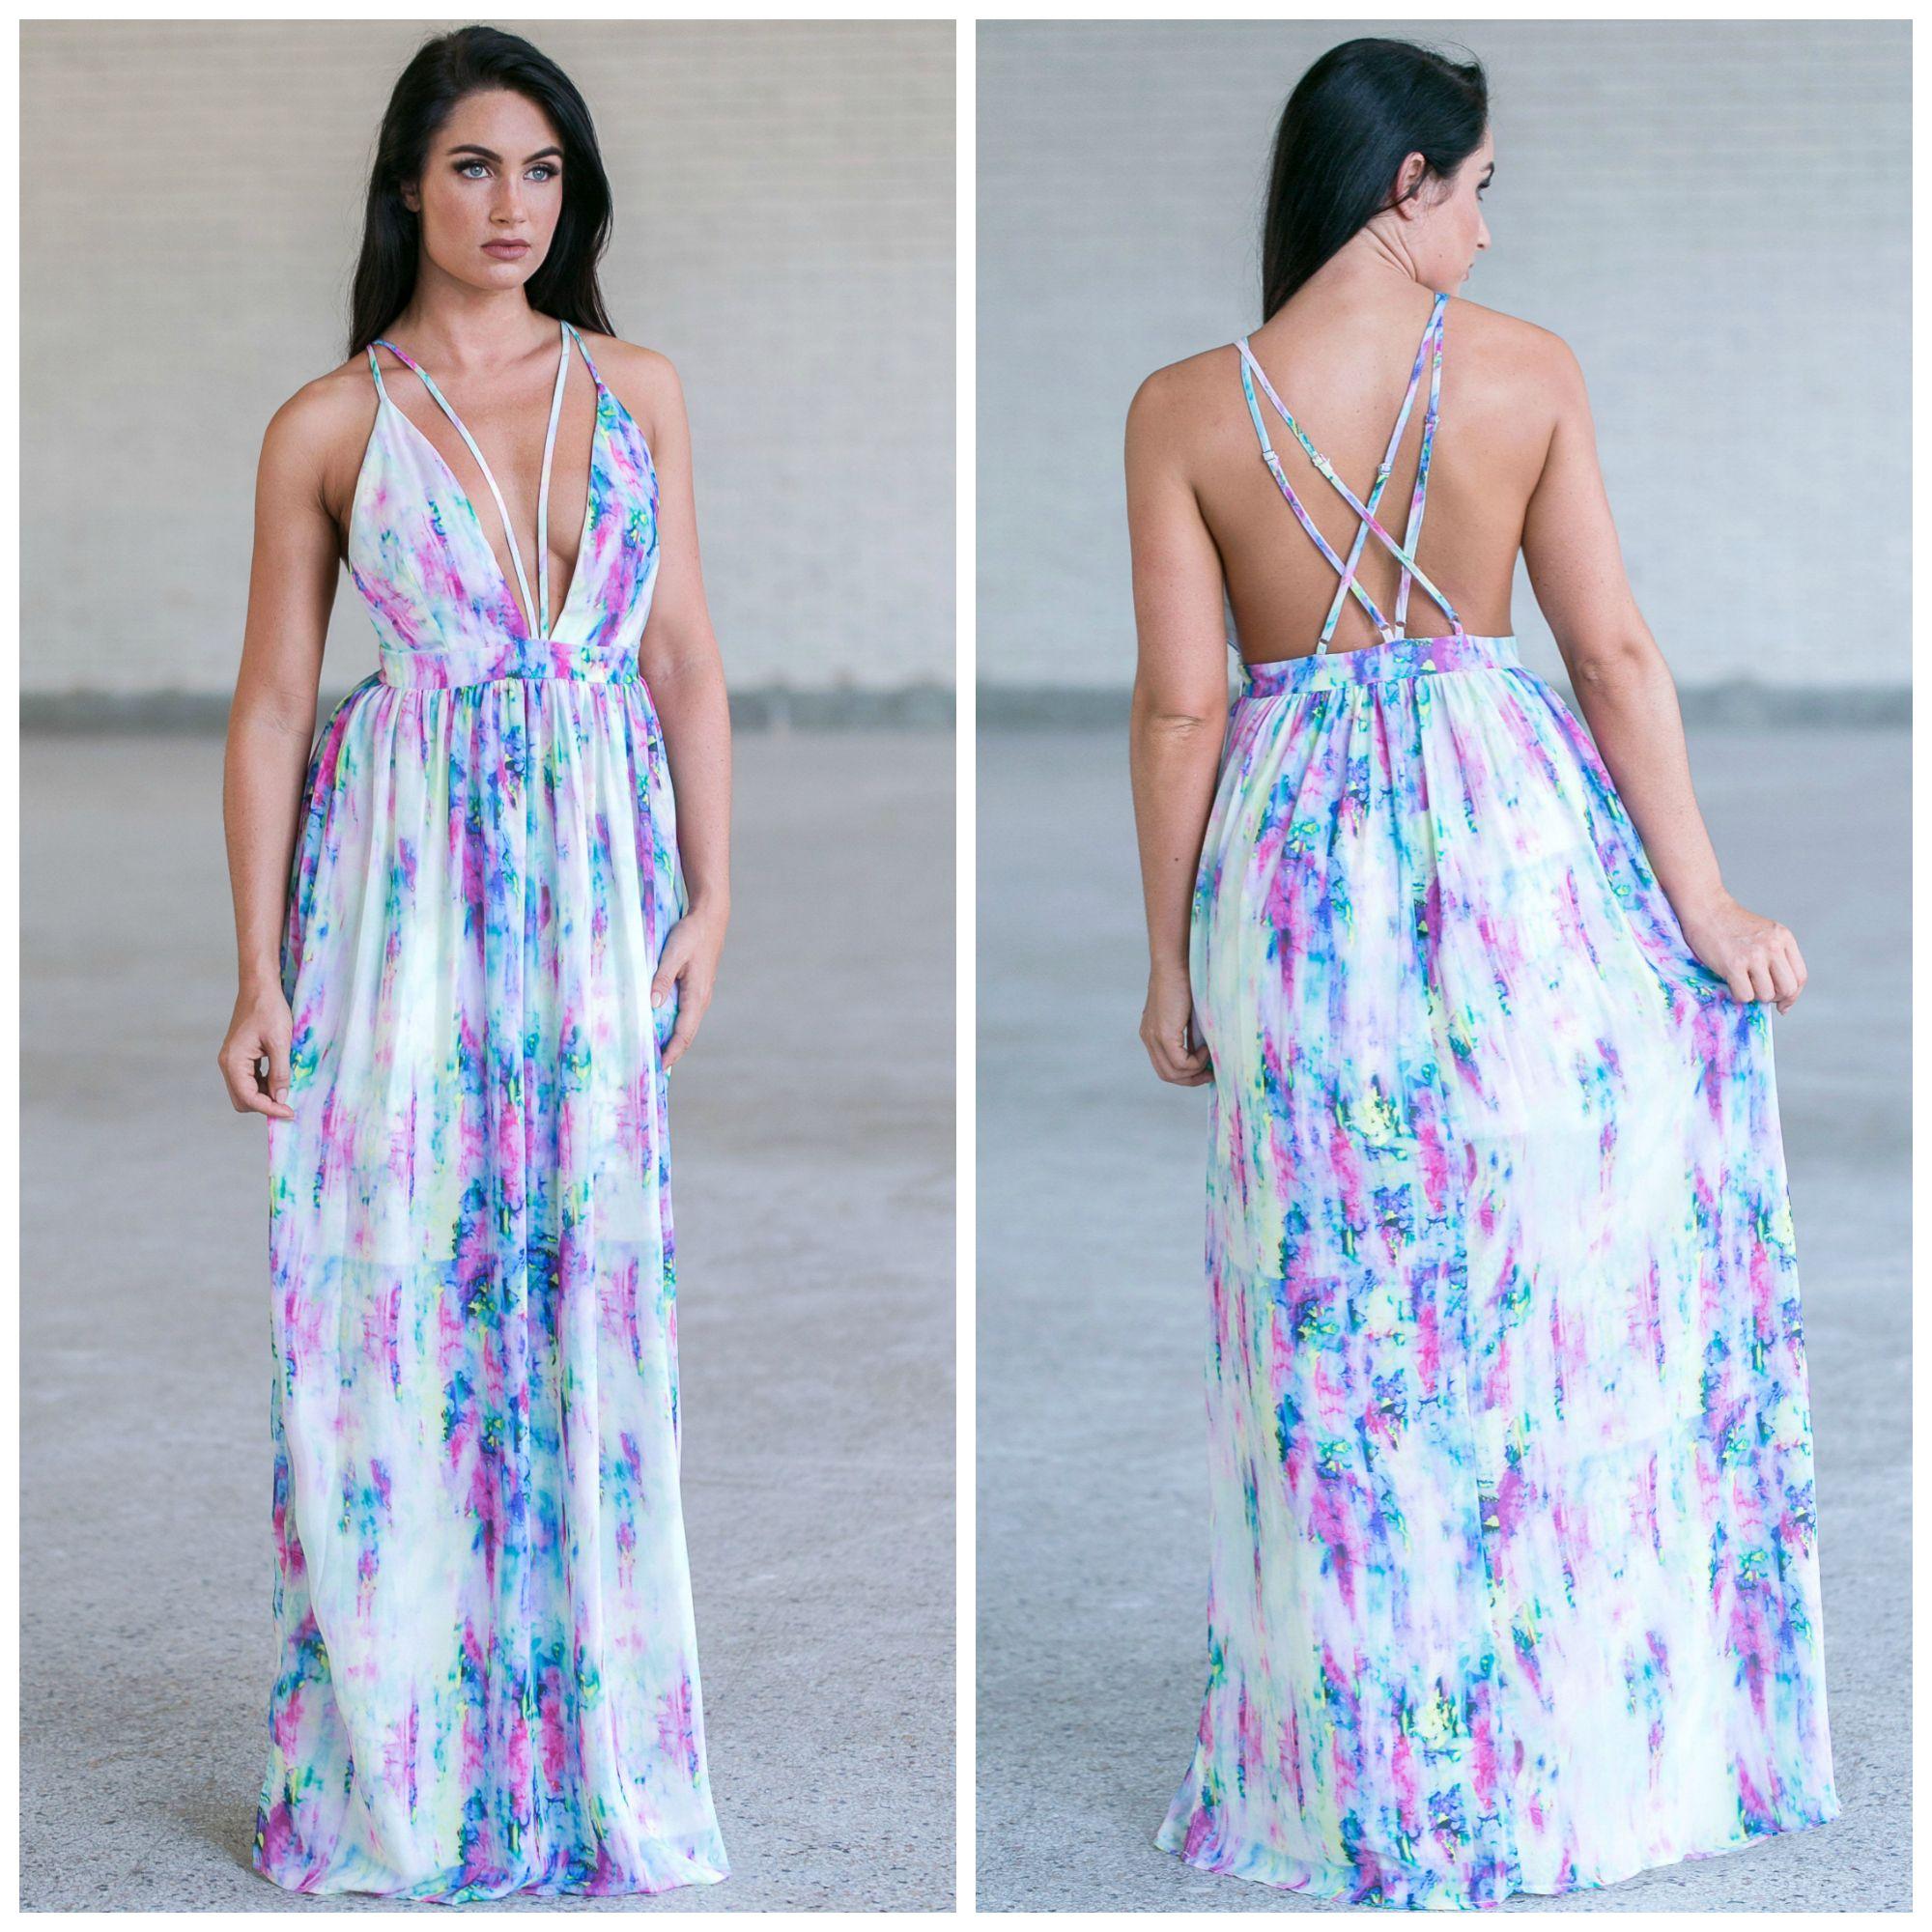 This maxi dress has a bright watercolor print ssa